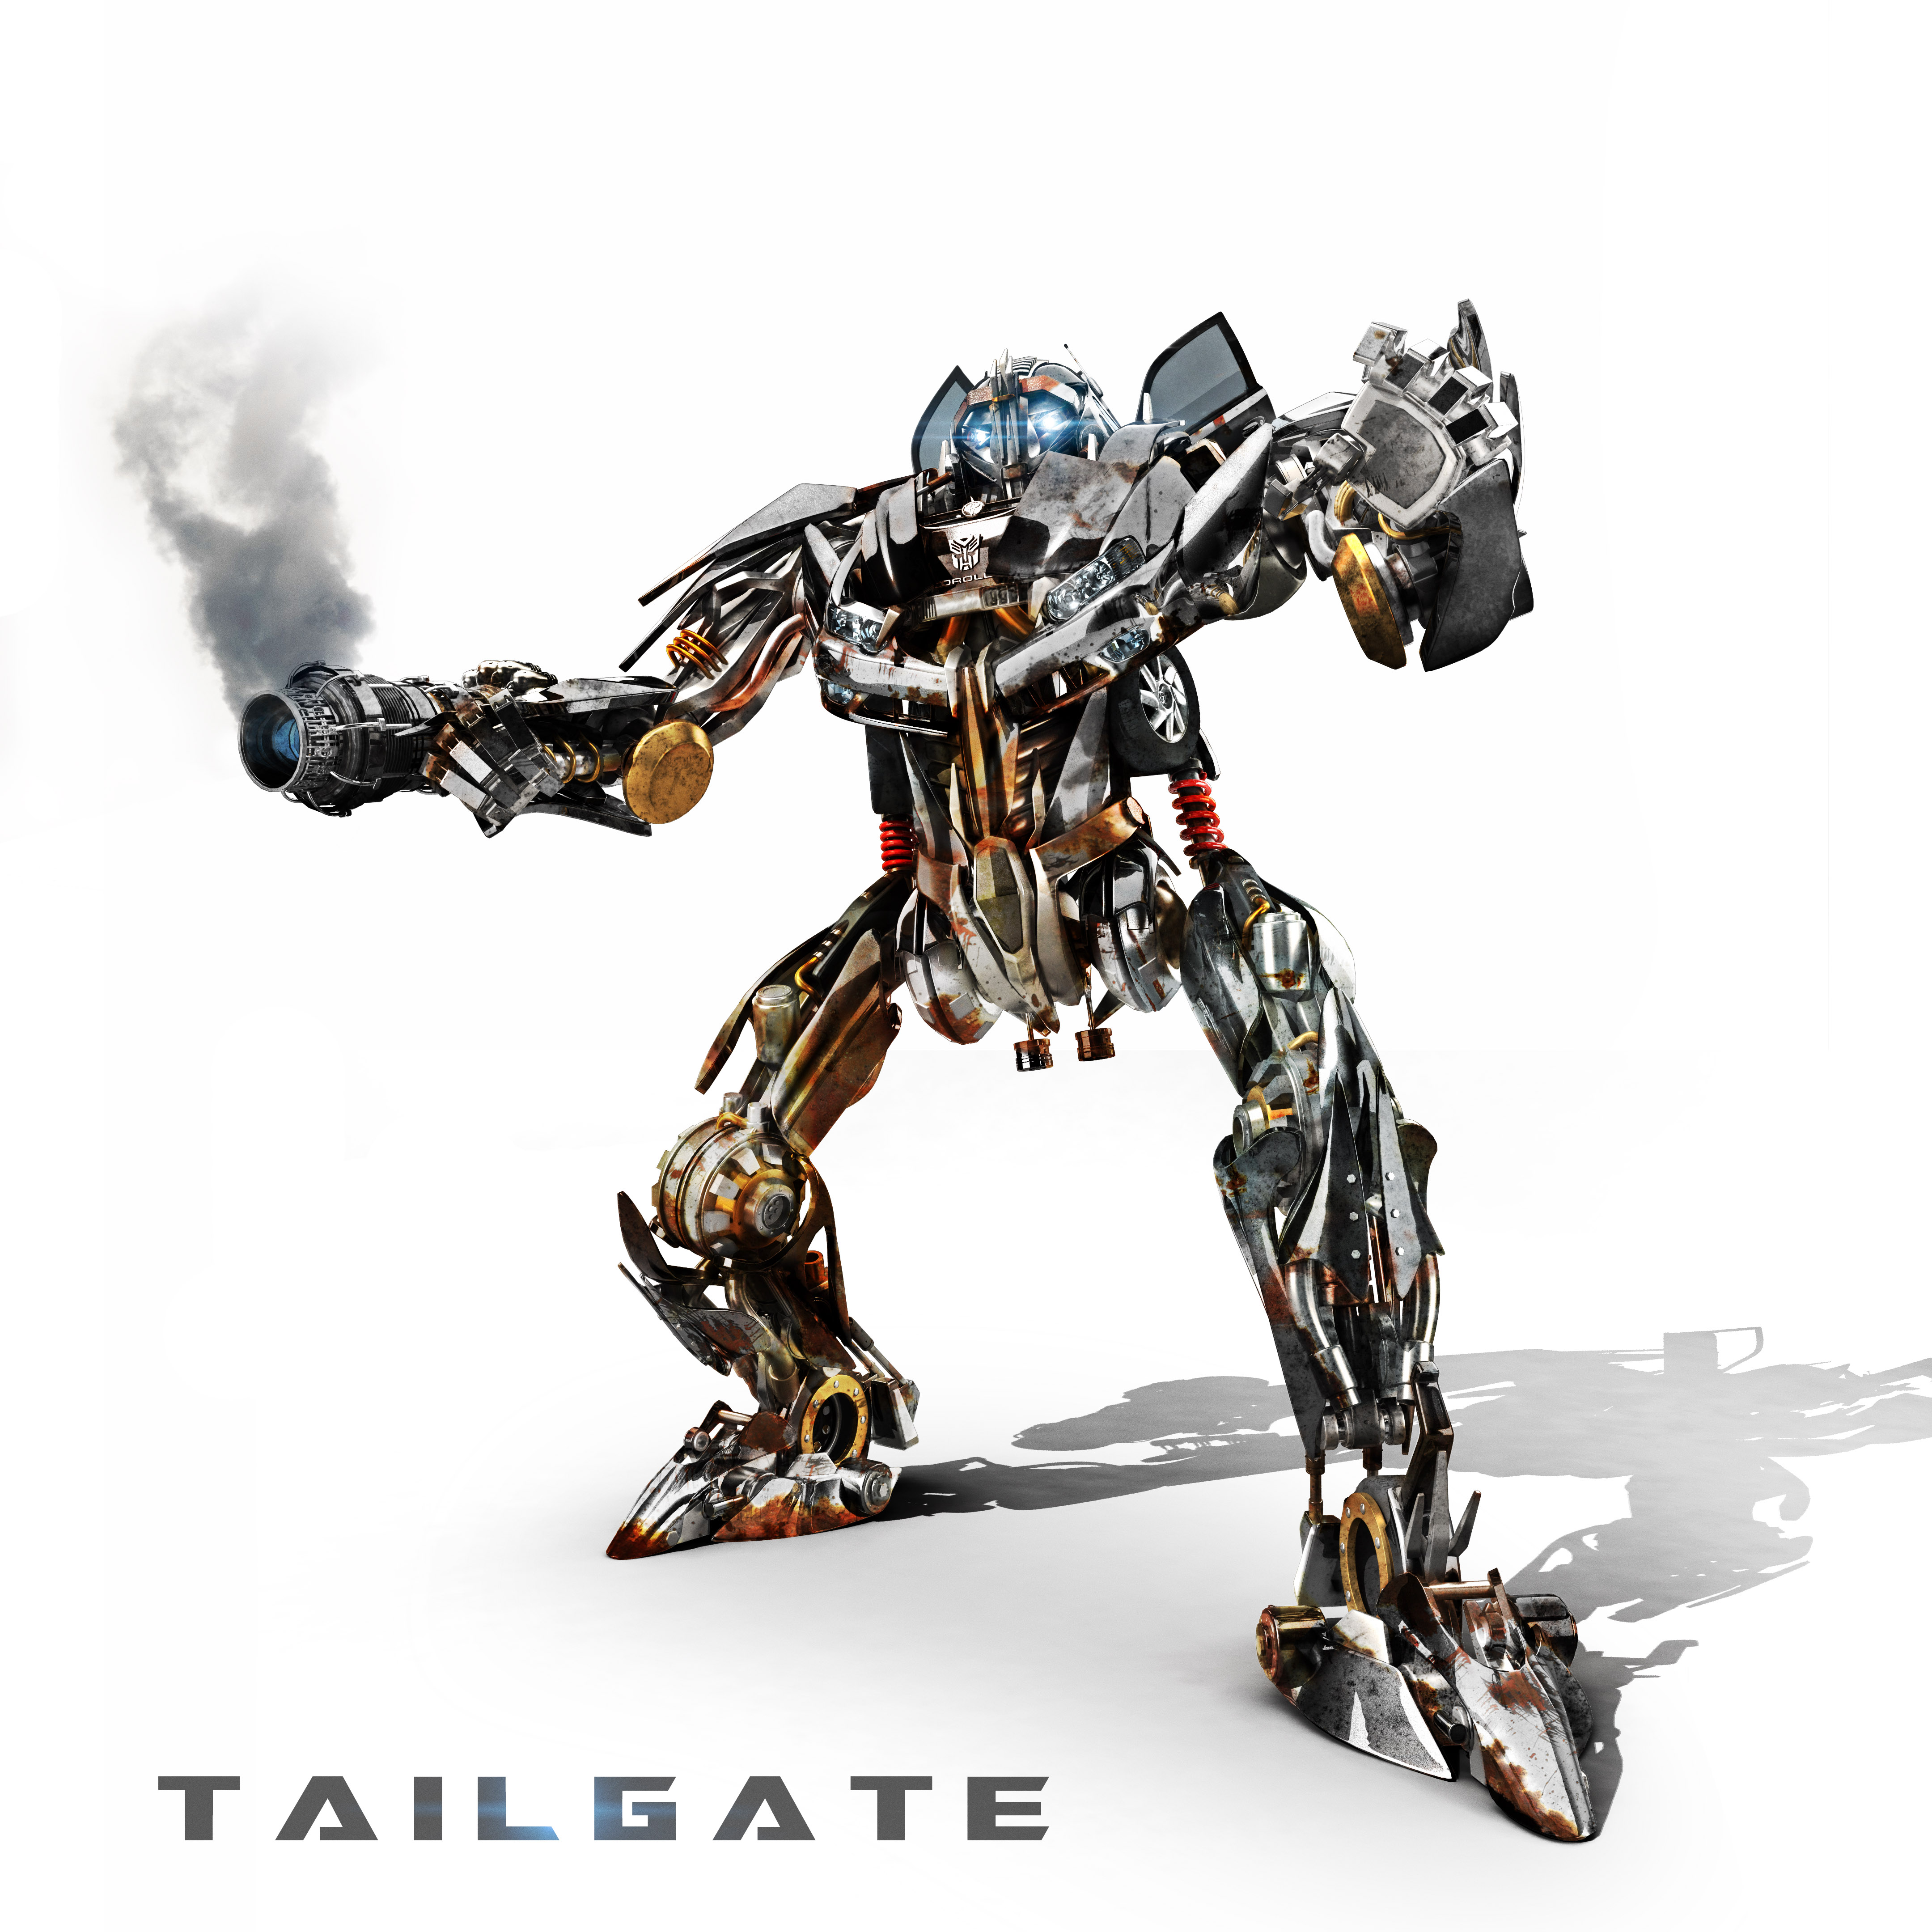 Transformer: Tailgate